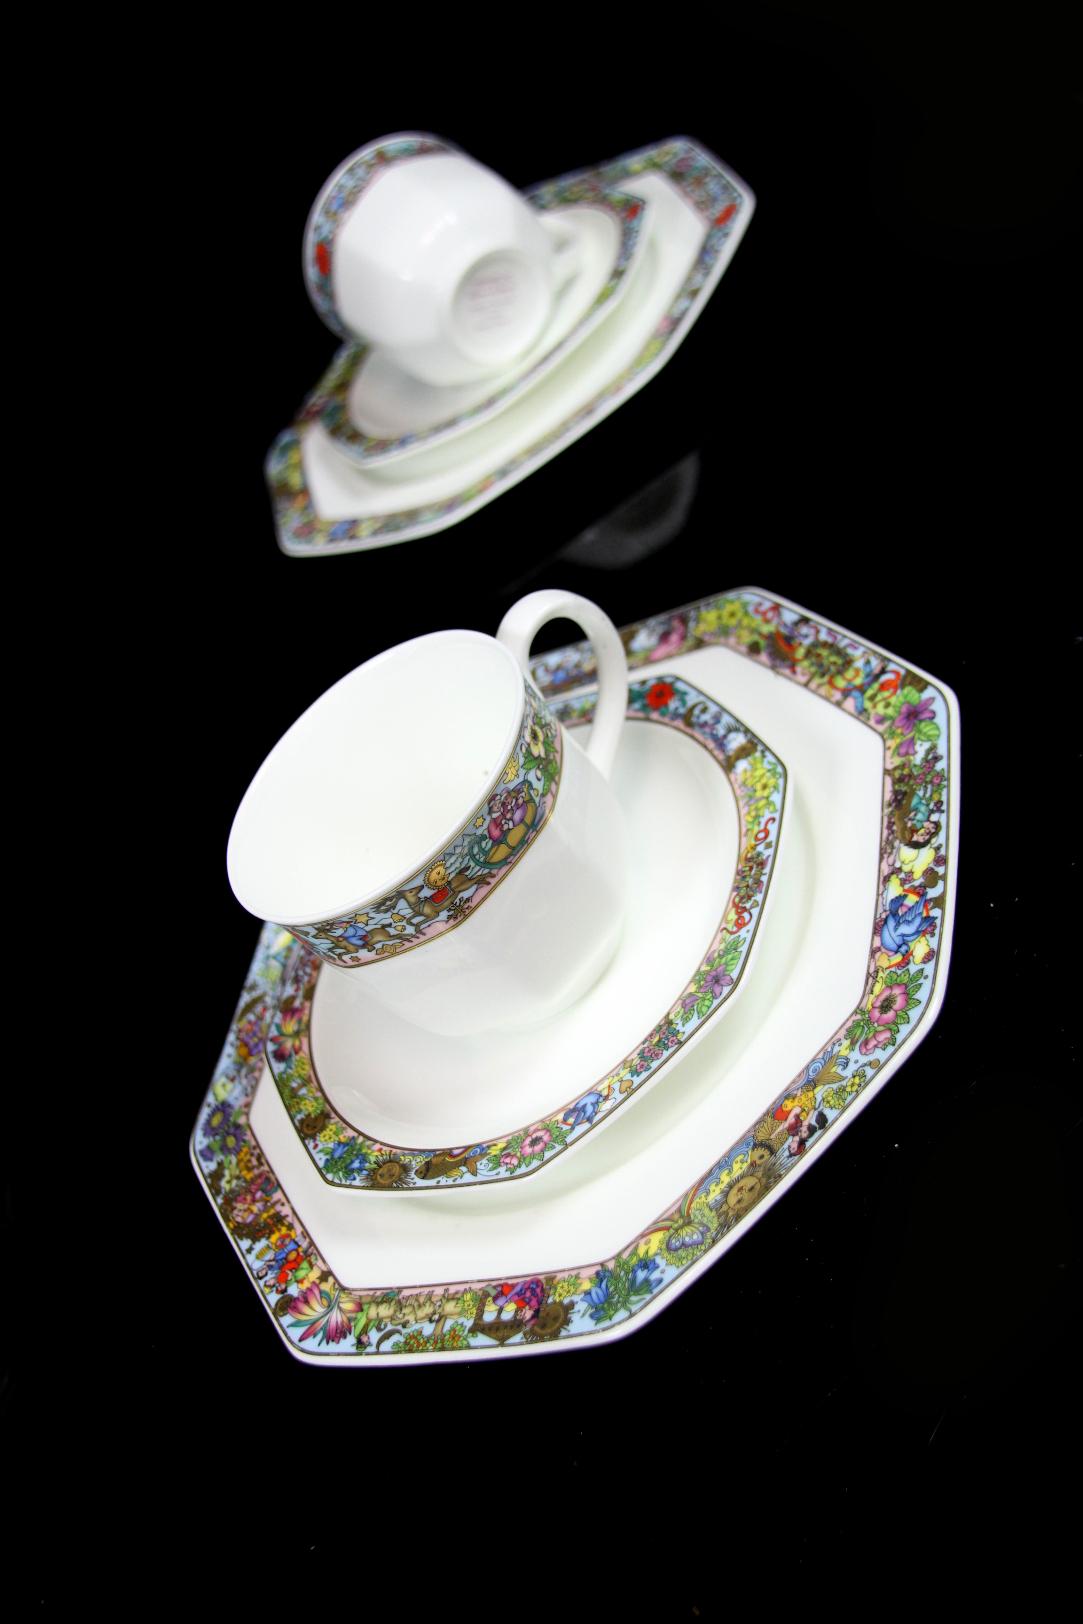 2 kaffeegedecke villeroy boch heinrich bone china porzellan happy seasons 2. Black Bedroom Furniture Sets. Home Design Ideas